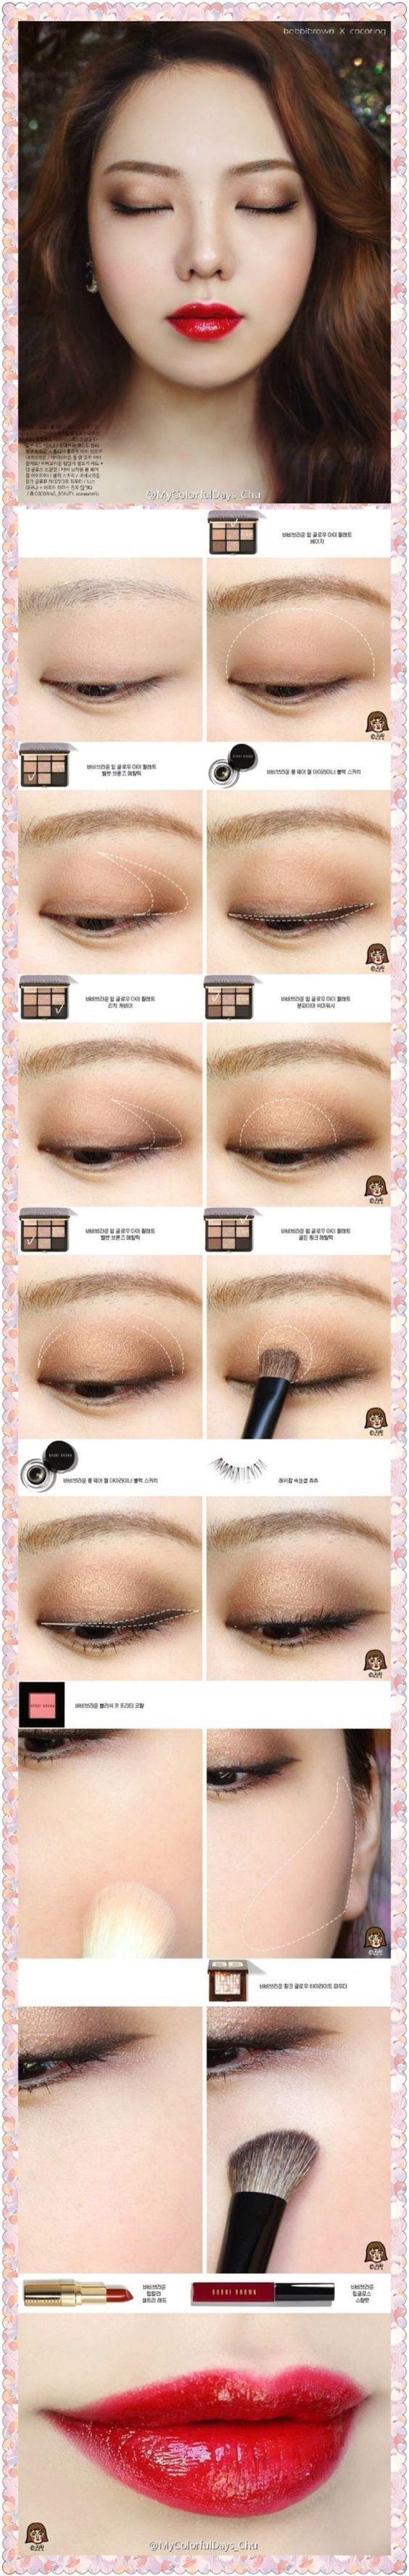 Top 12 Asian Eye Makeup Tutorials For Bride – Famous Fashion Wedding Design Idea